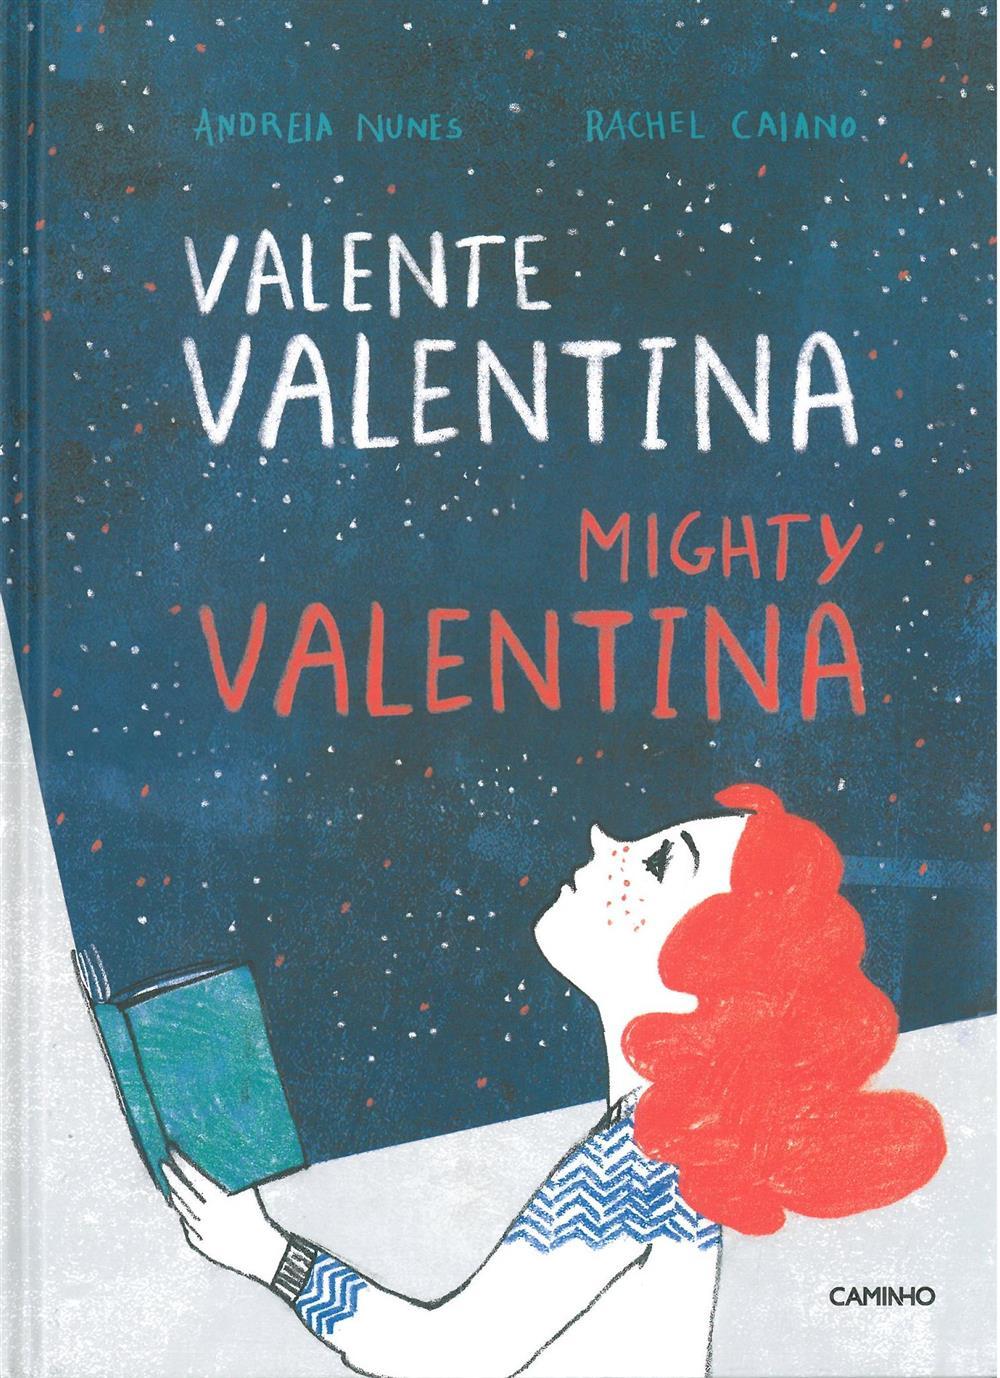 Valente Valentina.jpg